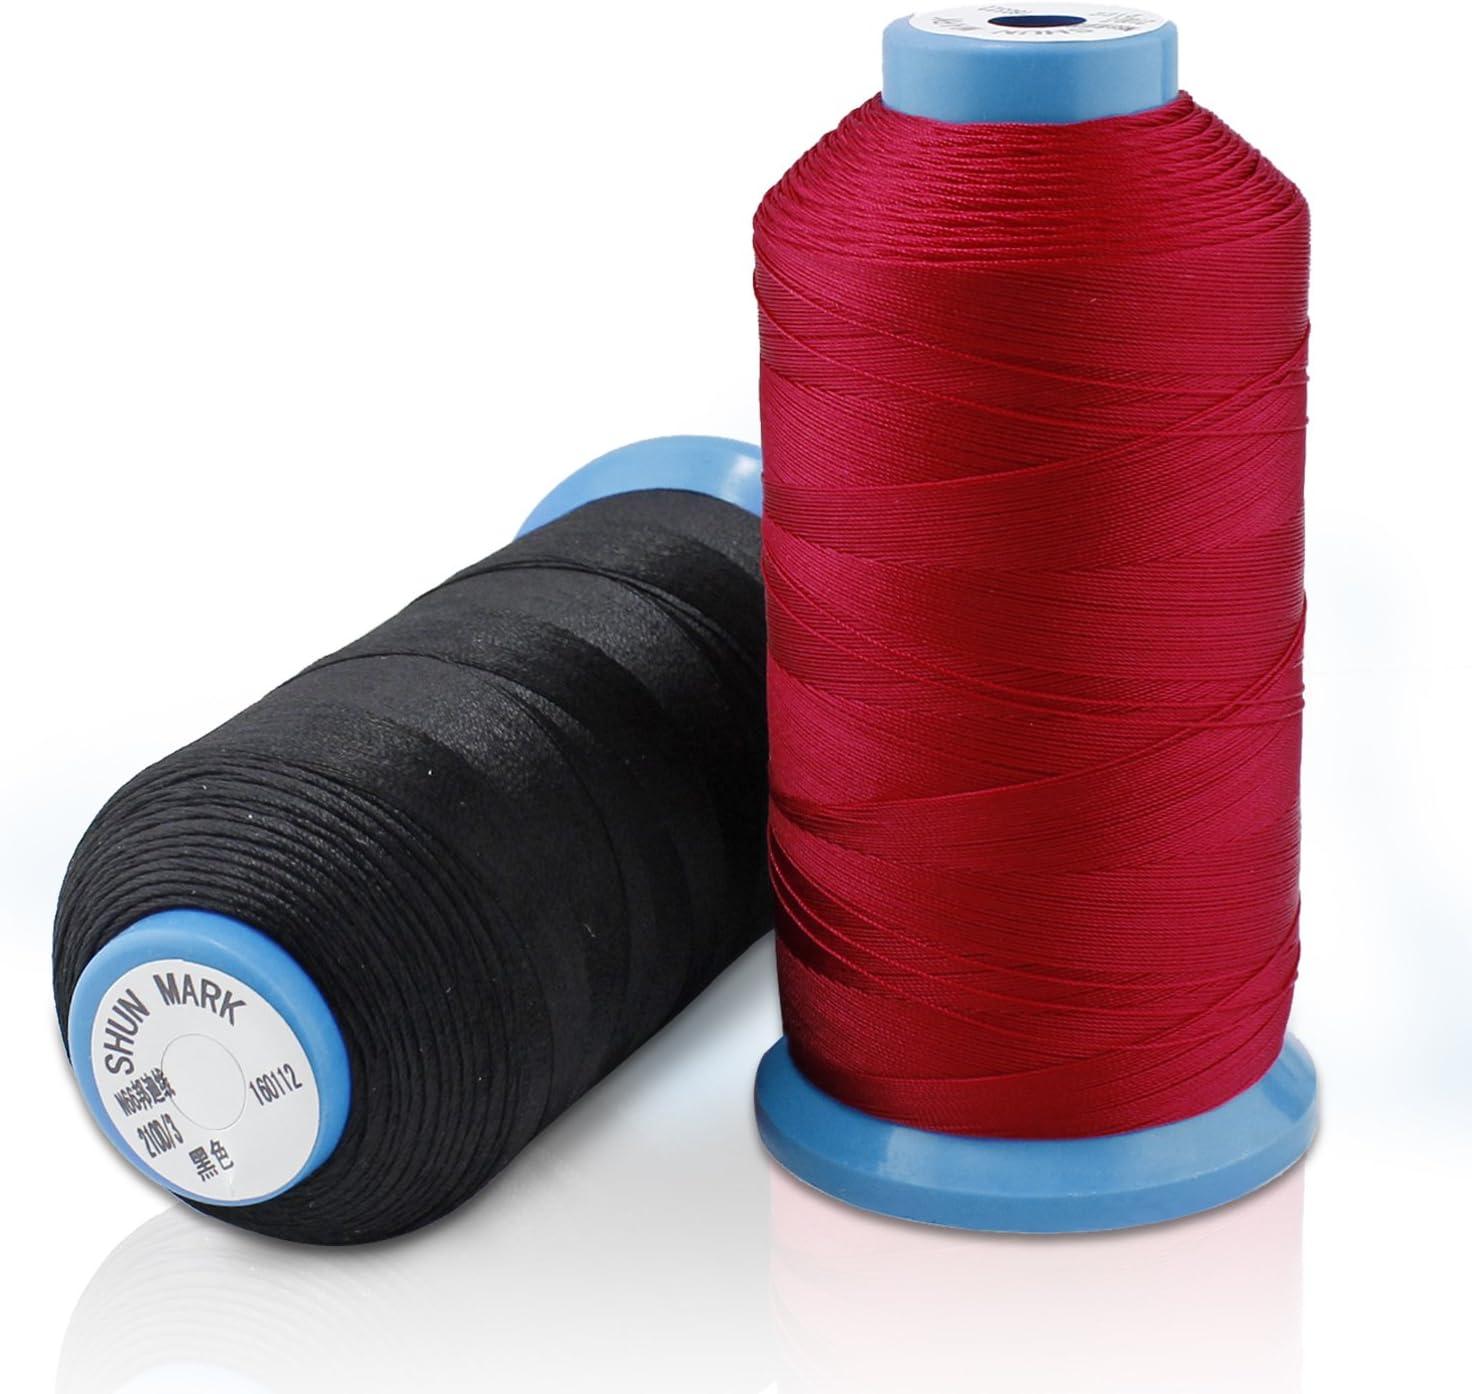 Hilo de coser de Nylon consolidado PsmGoods fuerte para máquina de ...